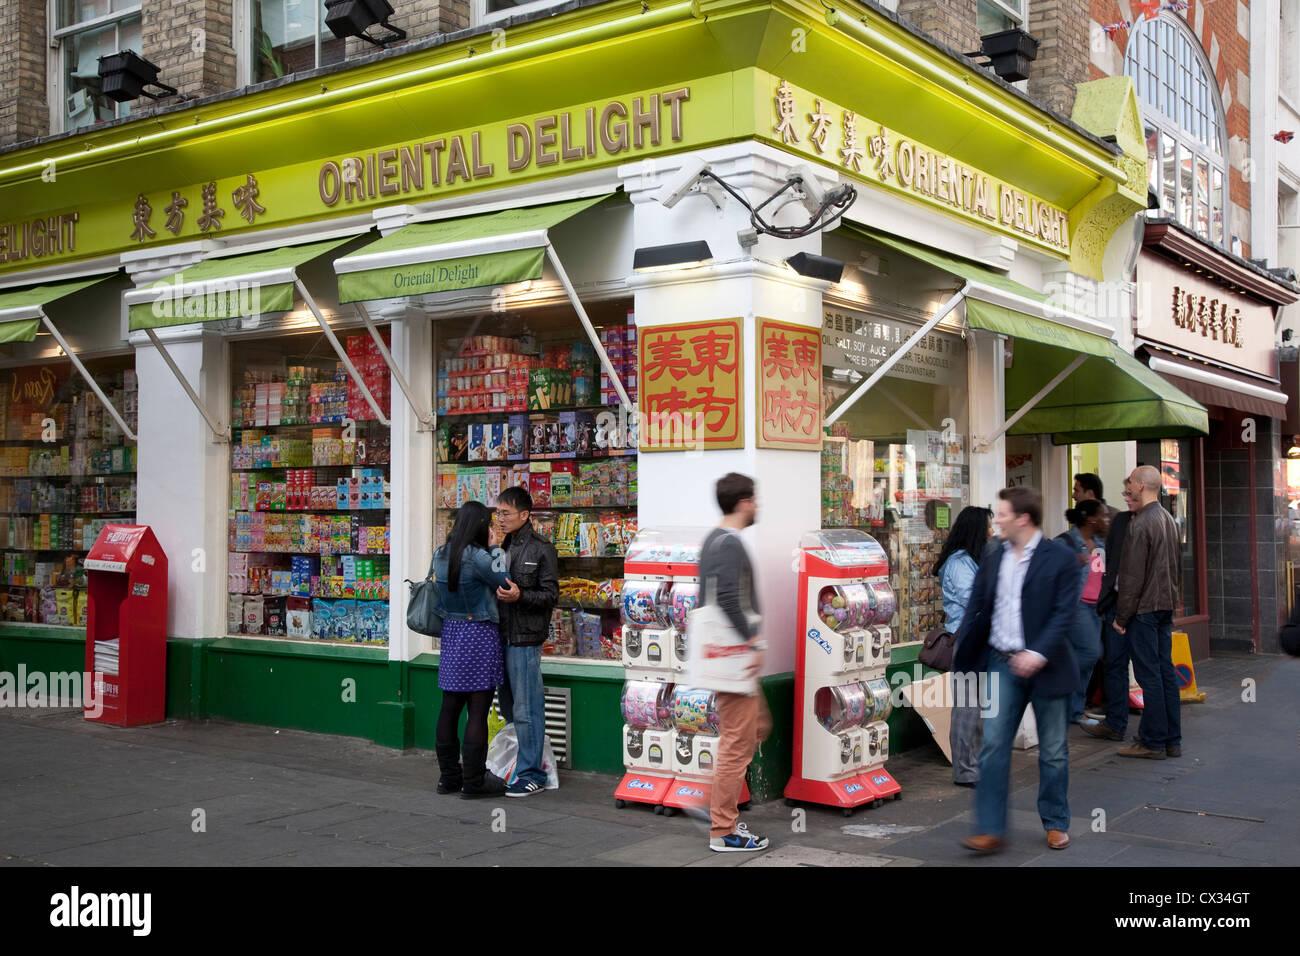 People outside Oriental Delight Shop, Soho, China Town, London, England, UK - Stock Image